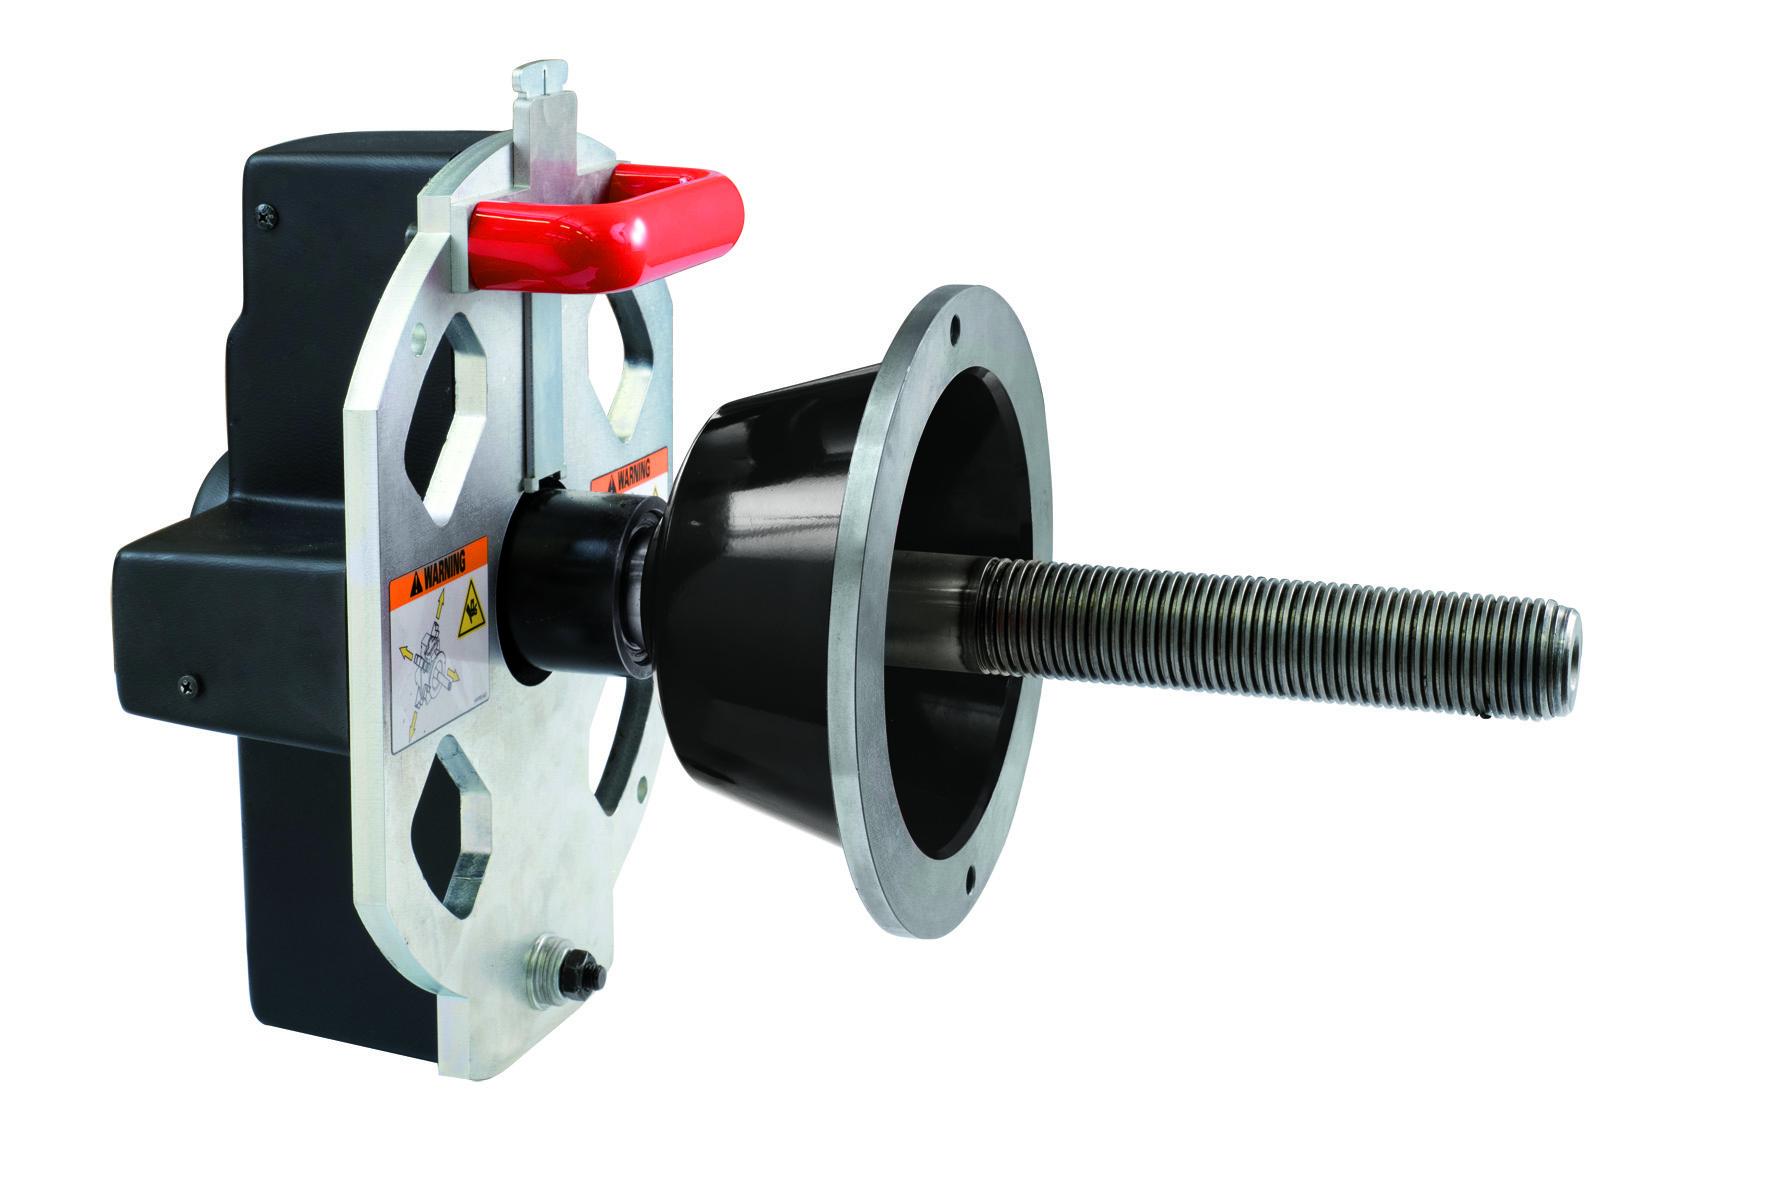 T500 truck wheel balancer